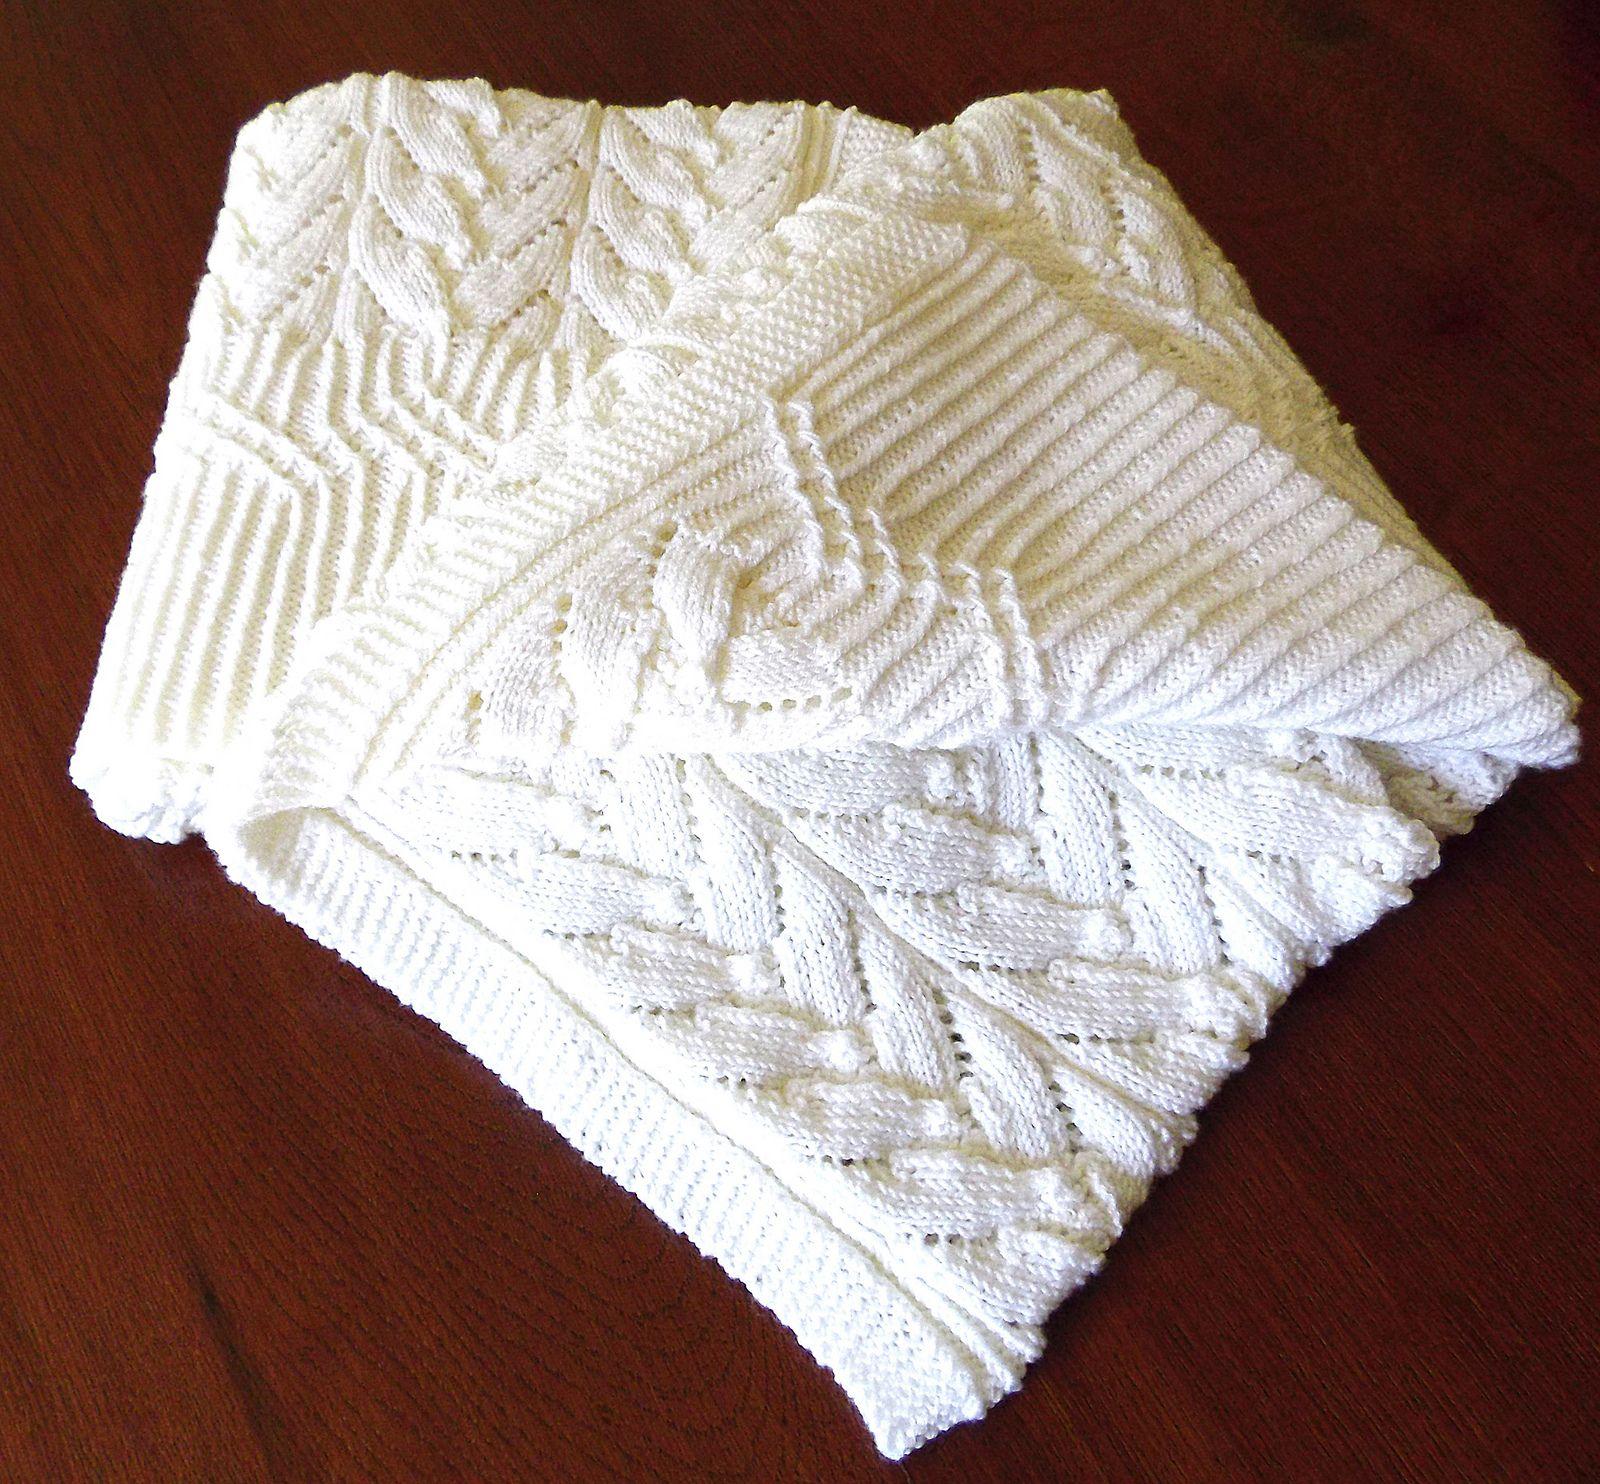 Cathedral Heirloom Baby Blanket pattern by OGE Knitwear Designs